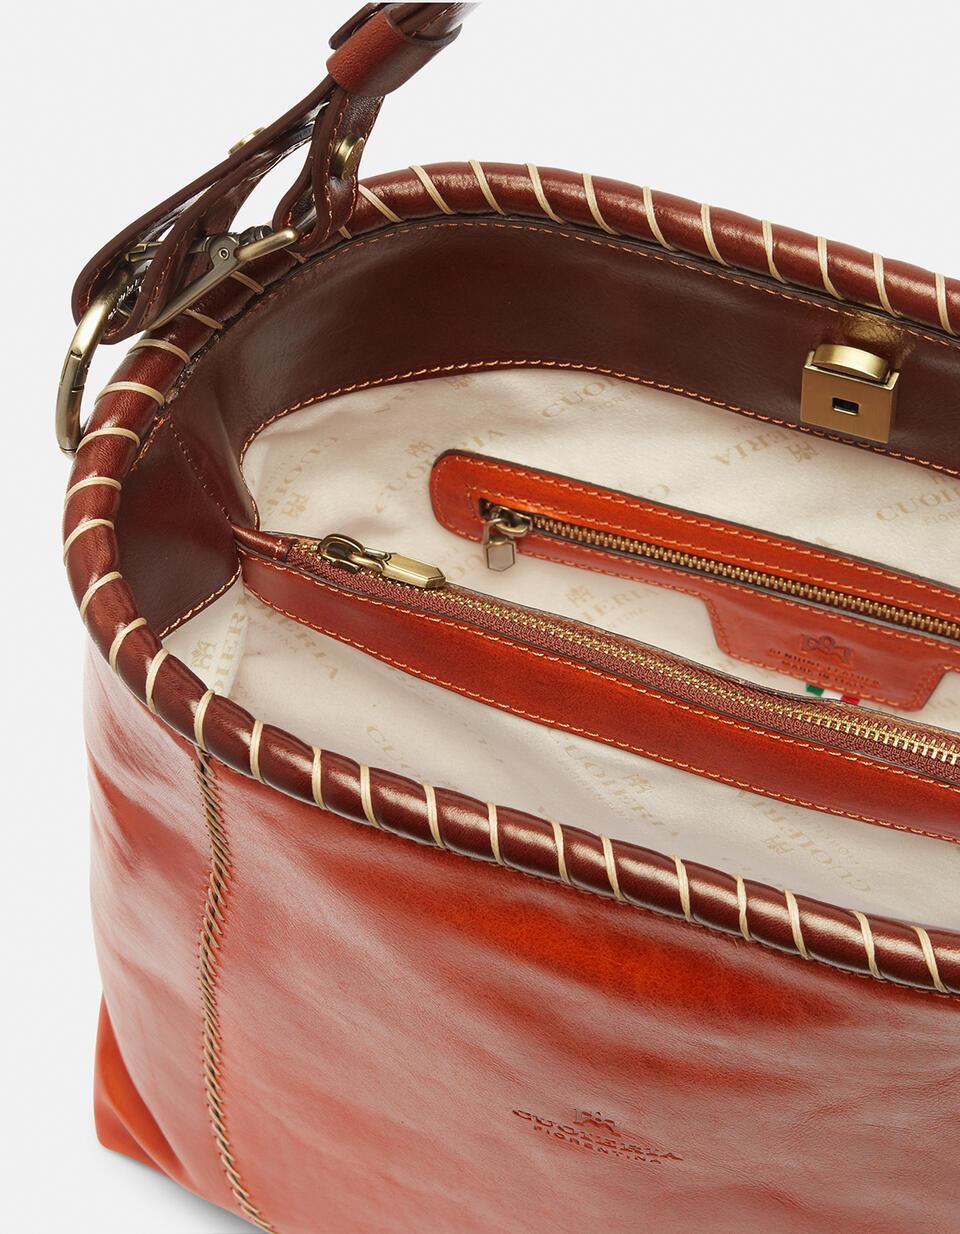 Warm and Colour hand-stitched shoulder bag ARANCIOBICOLORE Cuoieria Fiorentina